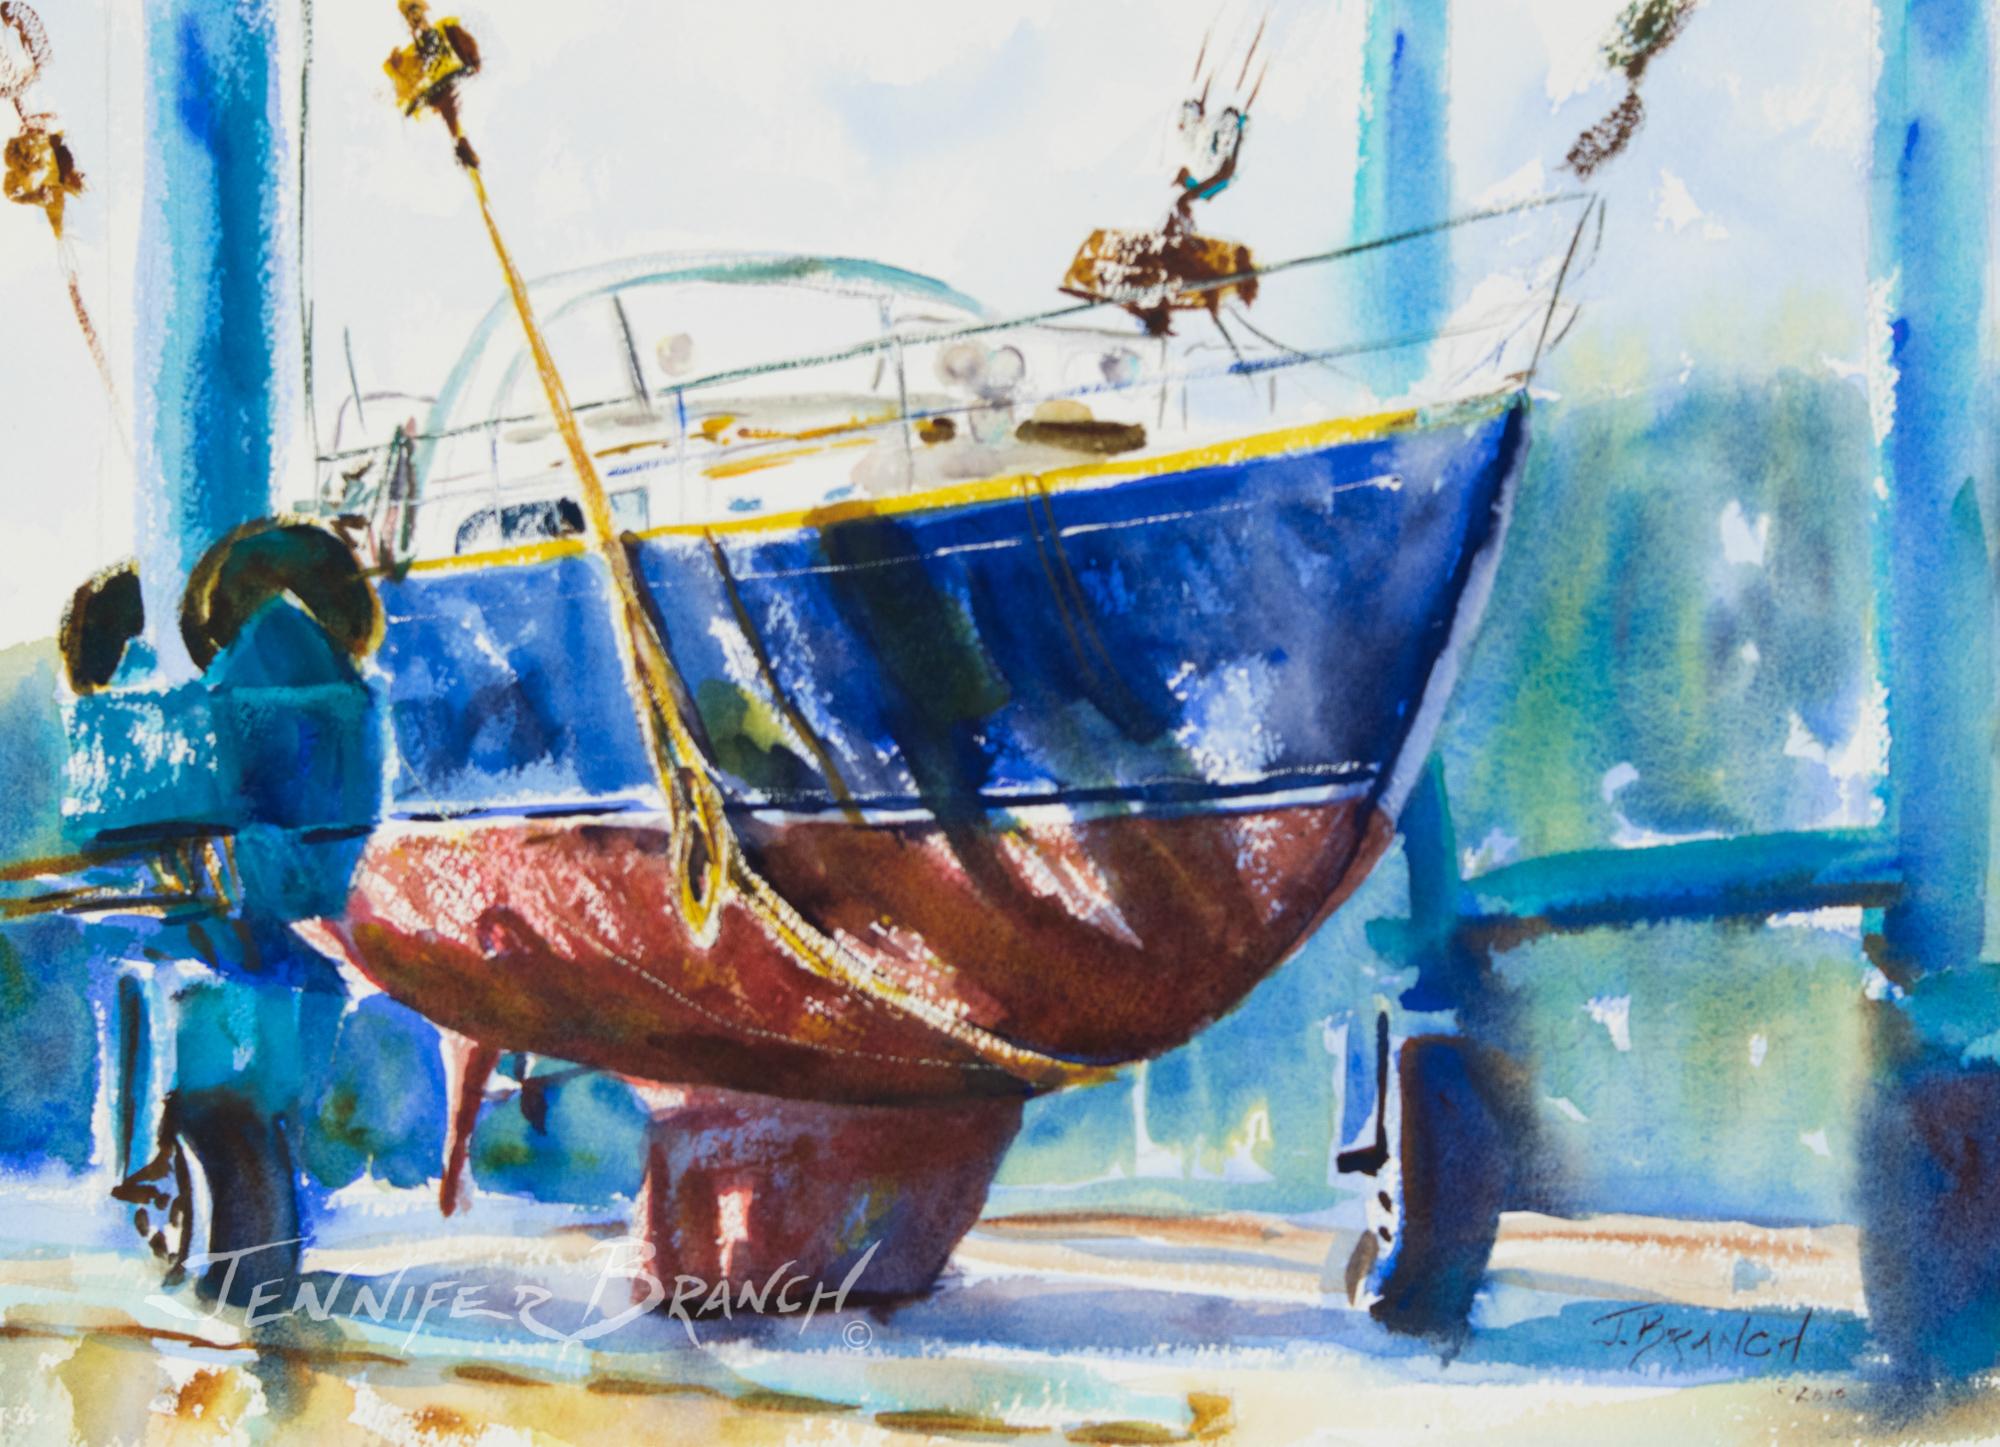 Hinckley Boatyard watercolor painting by Jennifer Branch